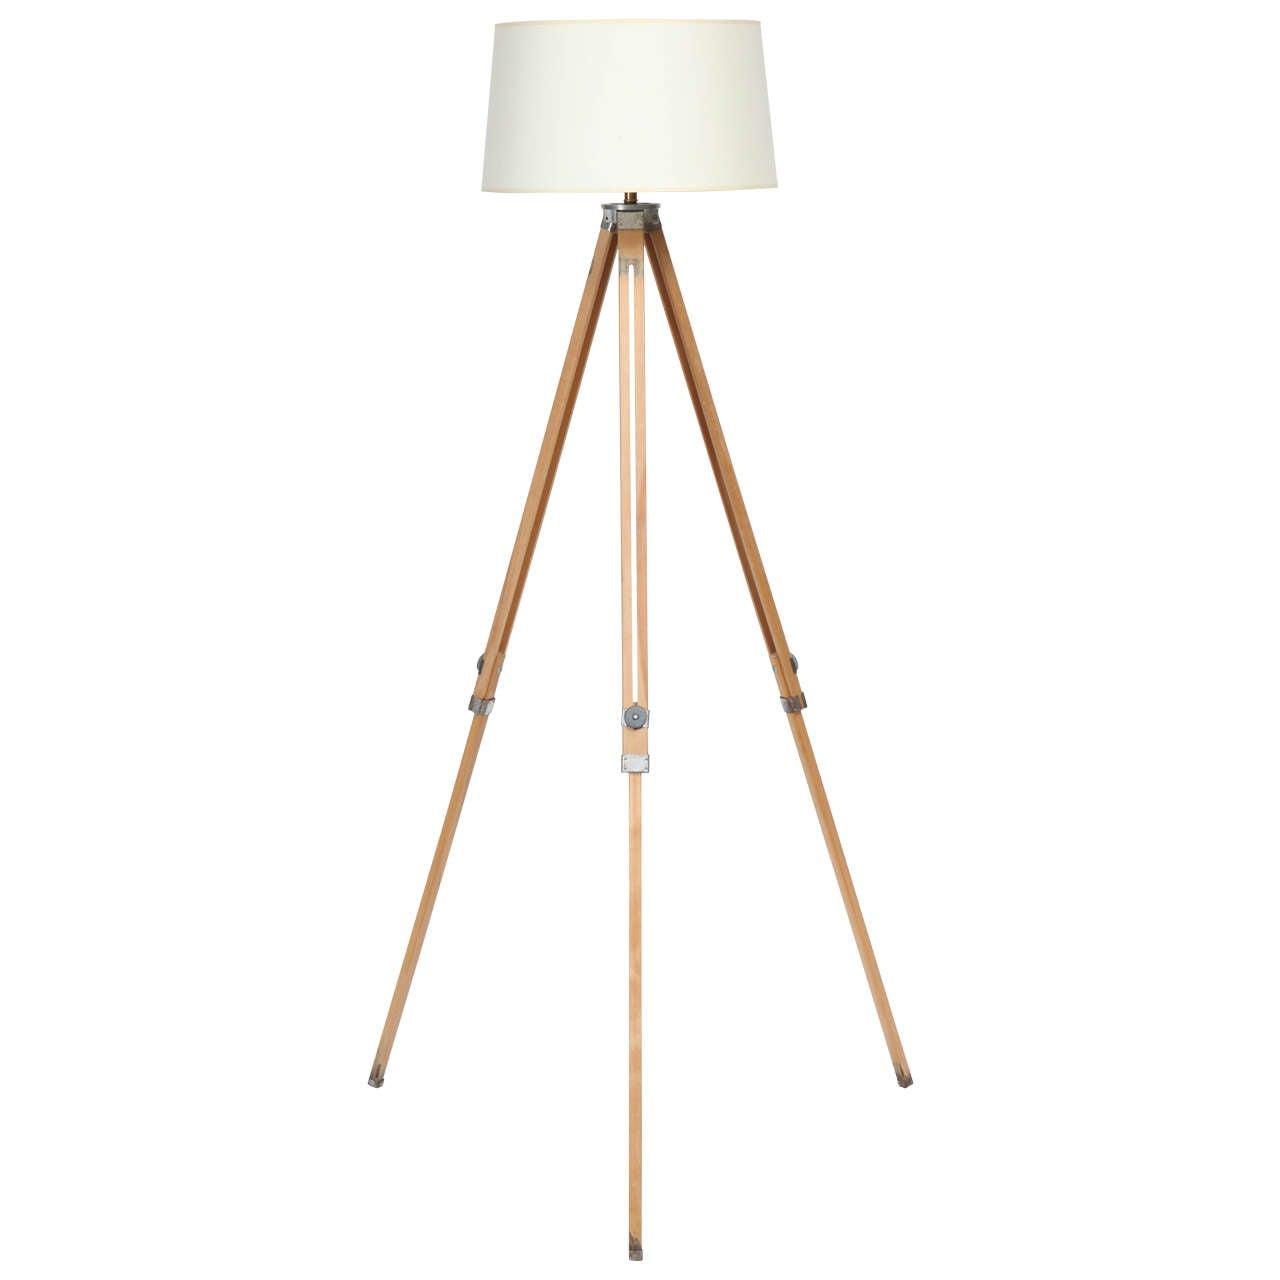 Vintage Tripod Floor Lamp For Sale At 1stdibs